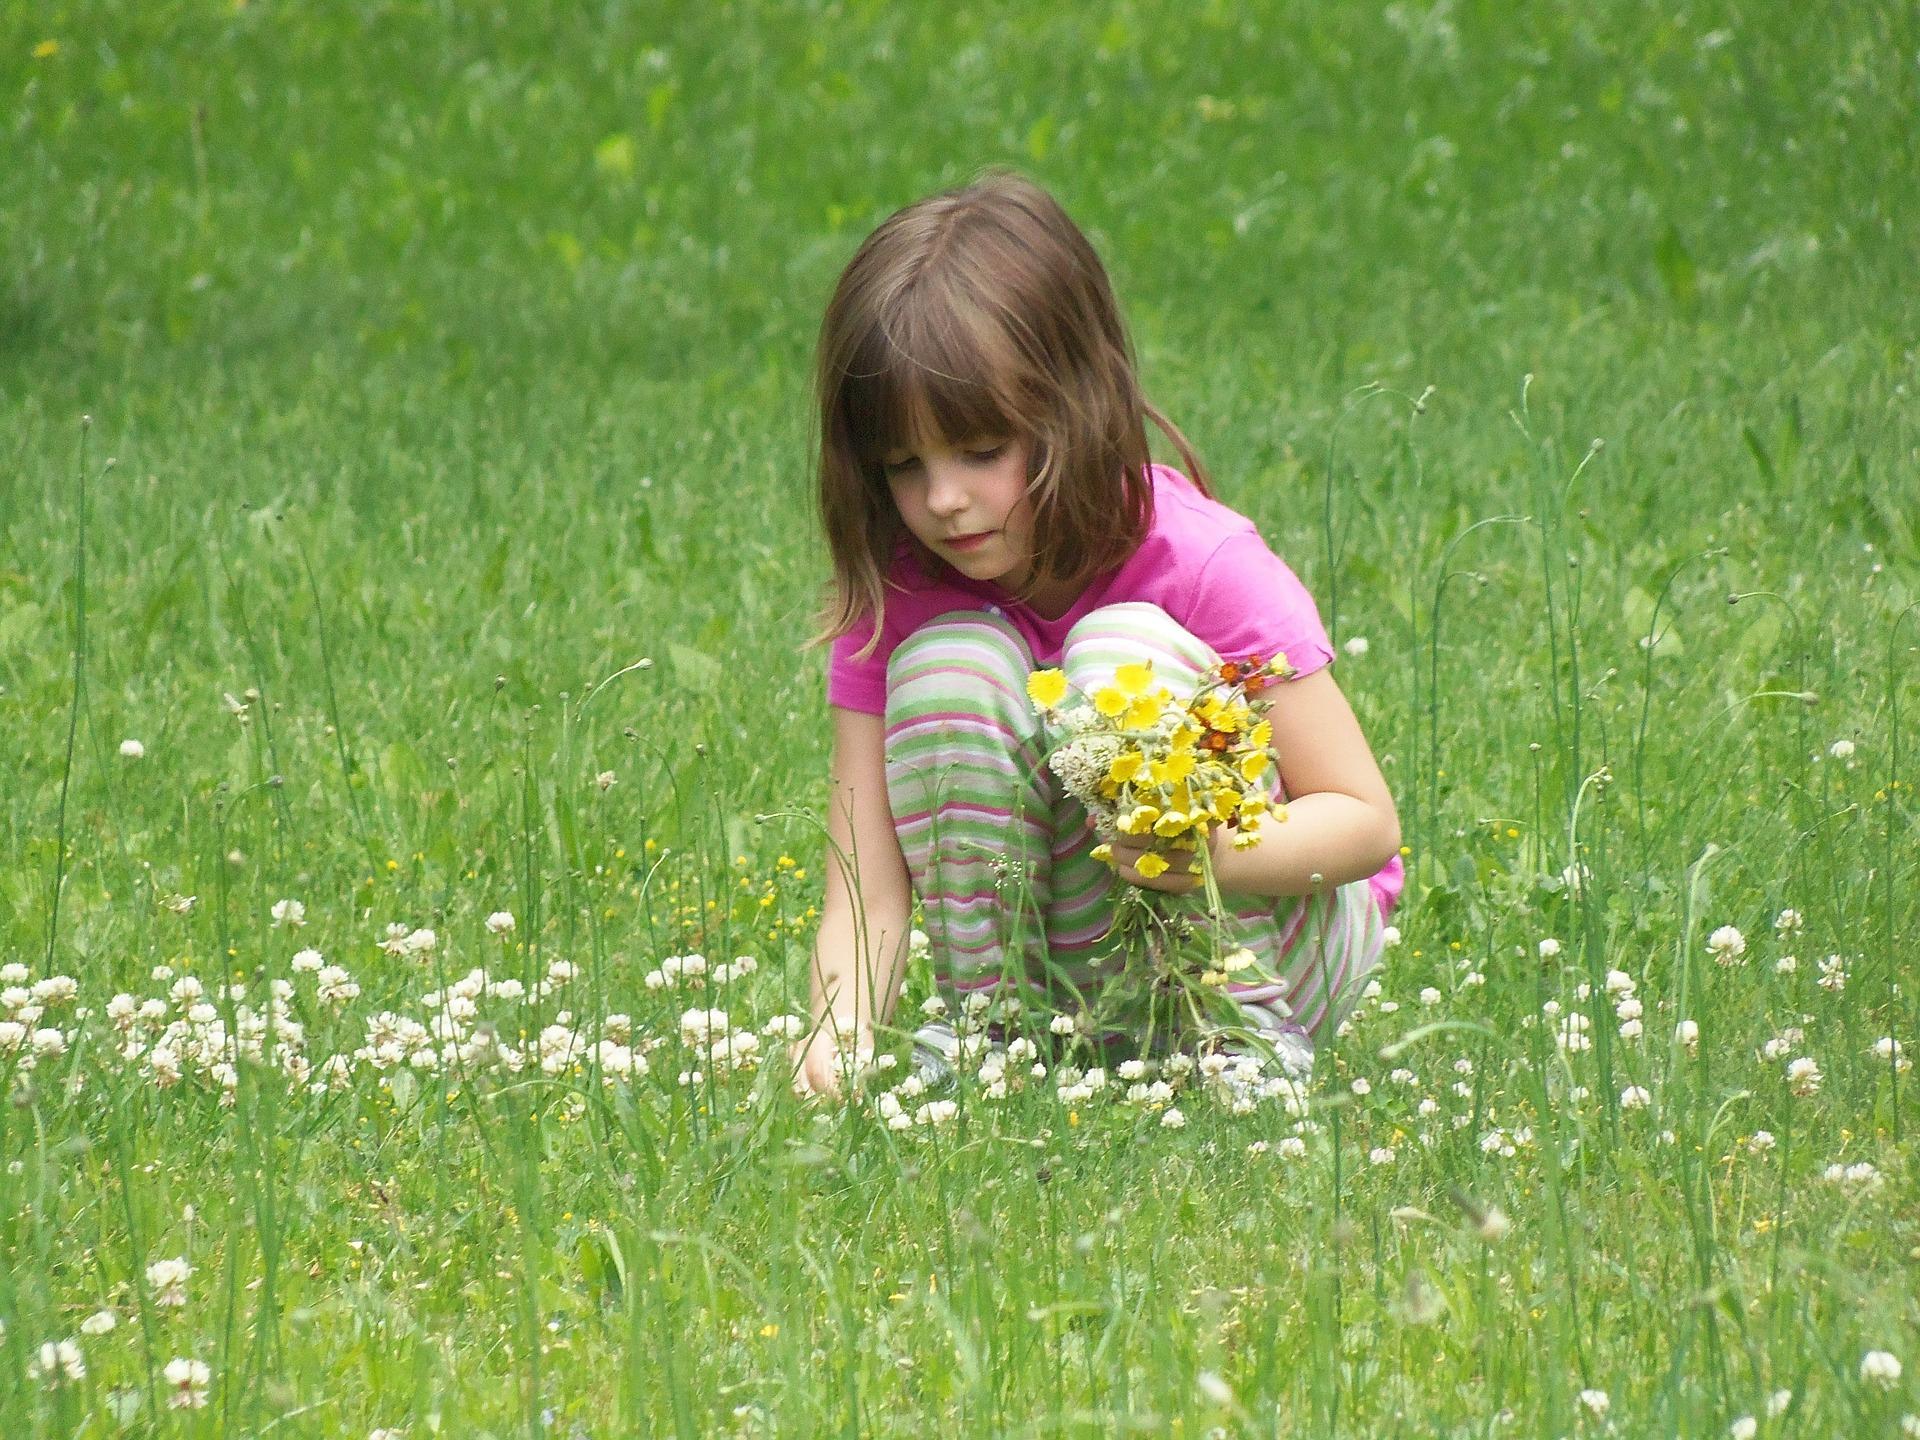 picking-flowers-391610_1920